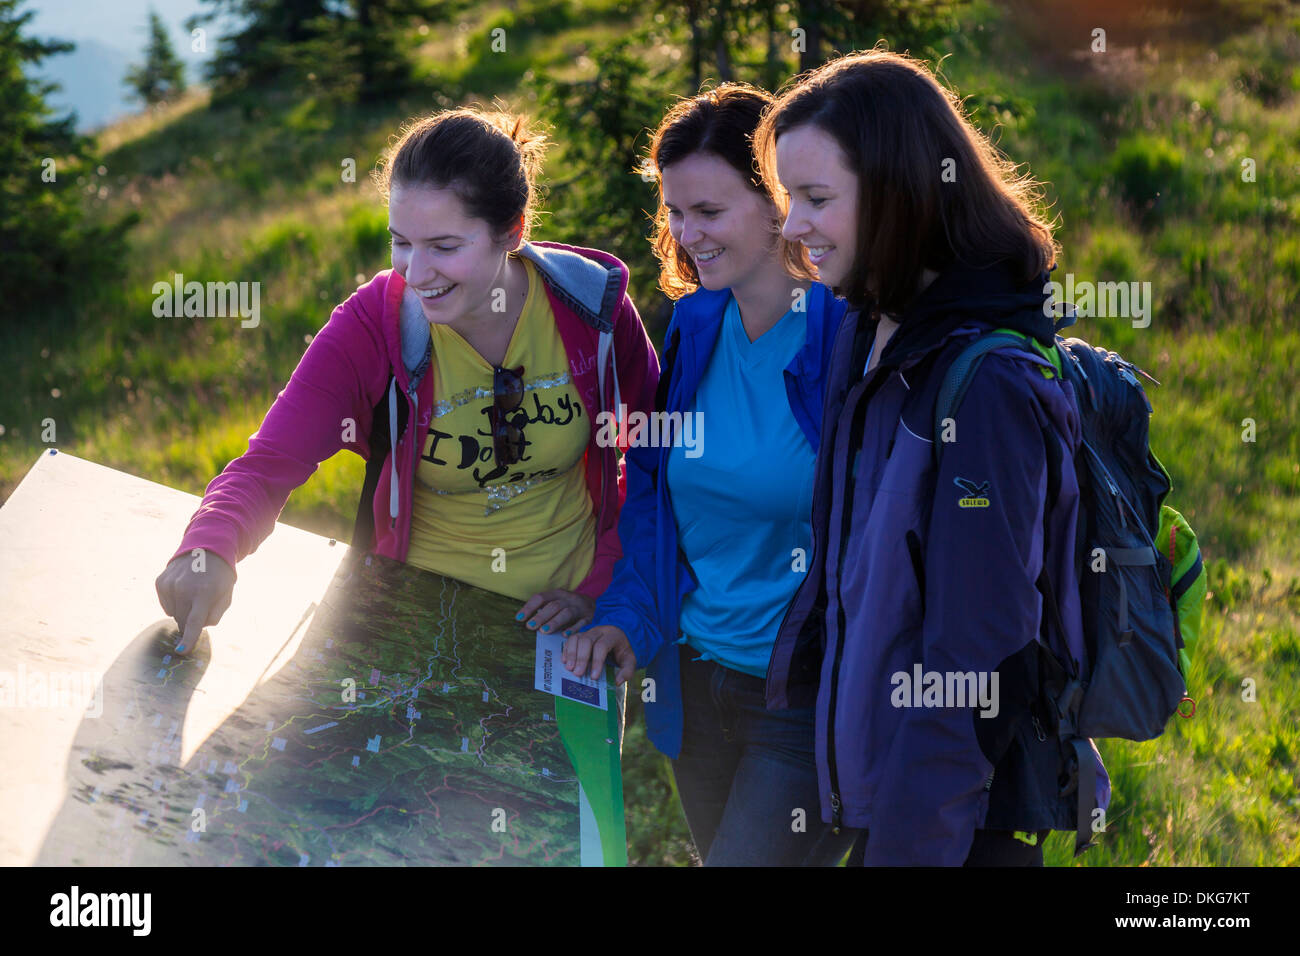 Three young women hiking, Hochkoenig, Berchtesgaden Alps, Salzburger Land, Austria, Europe - Stock Image